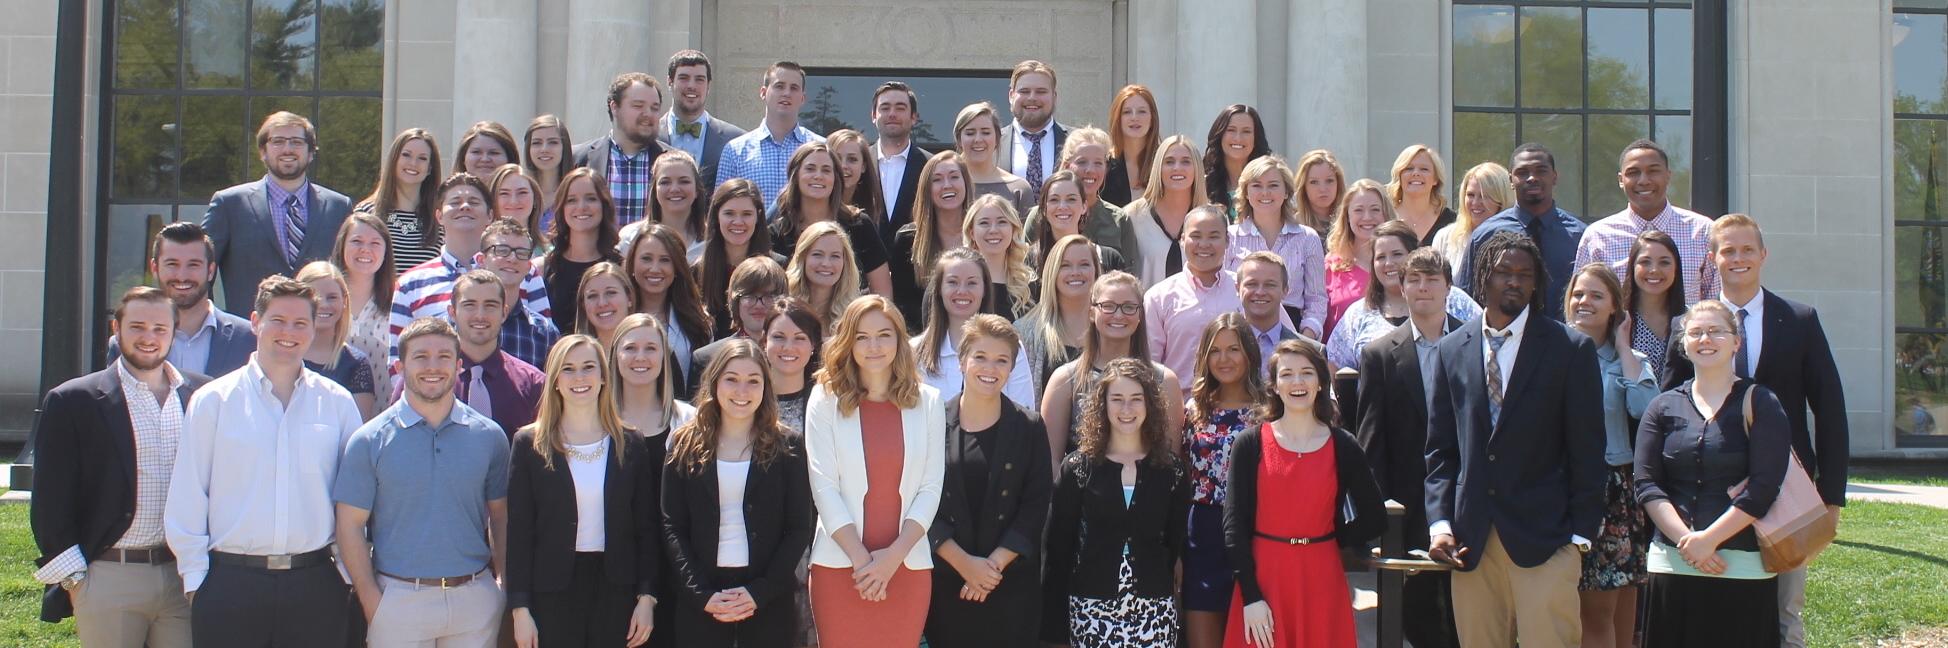 Communication Studies Graduates group photo